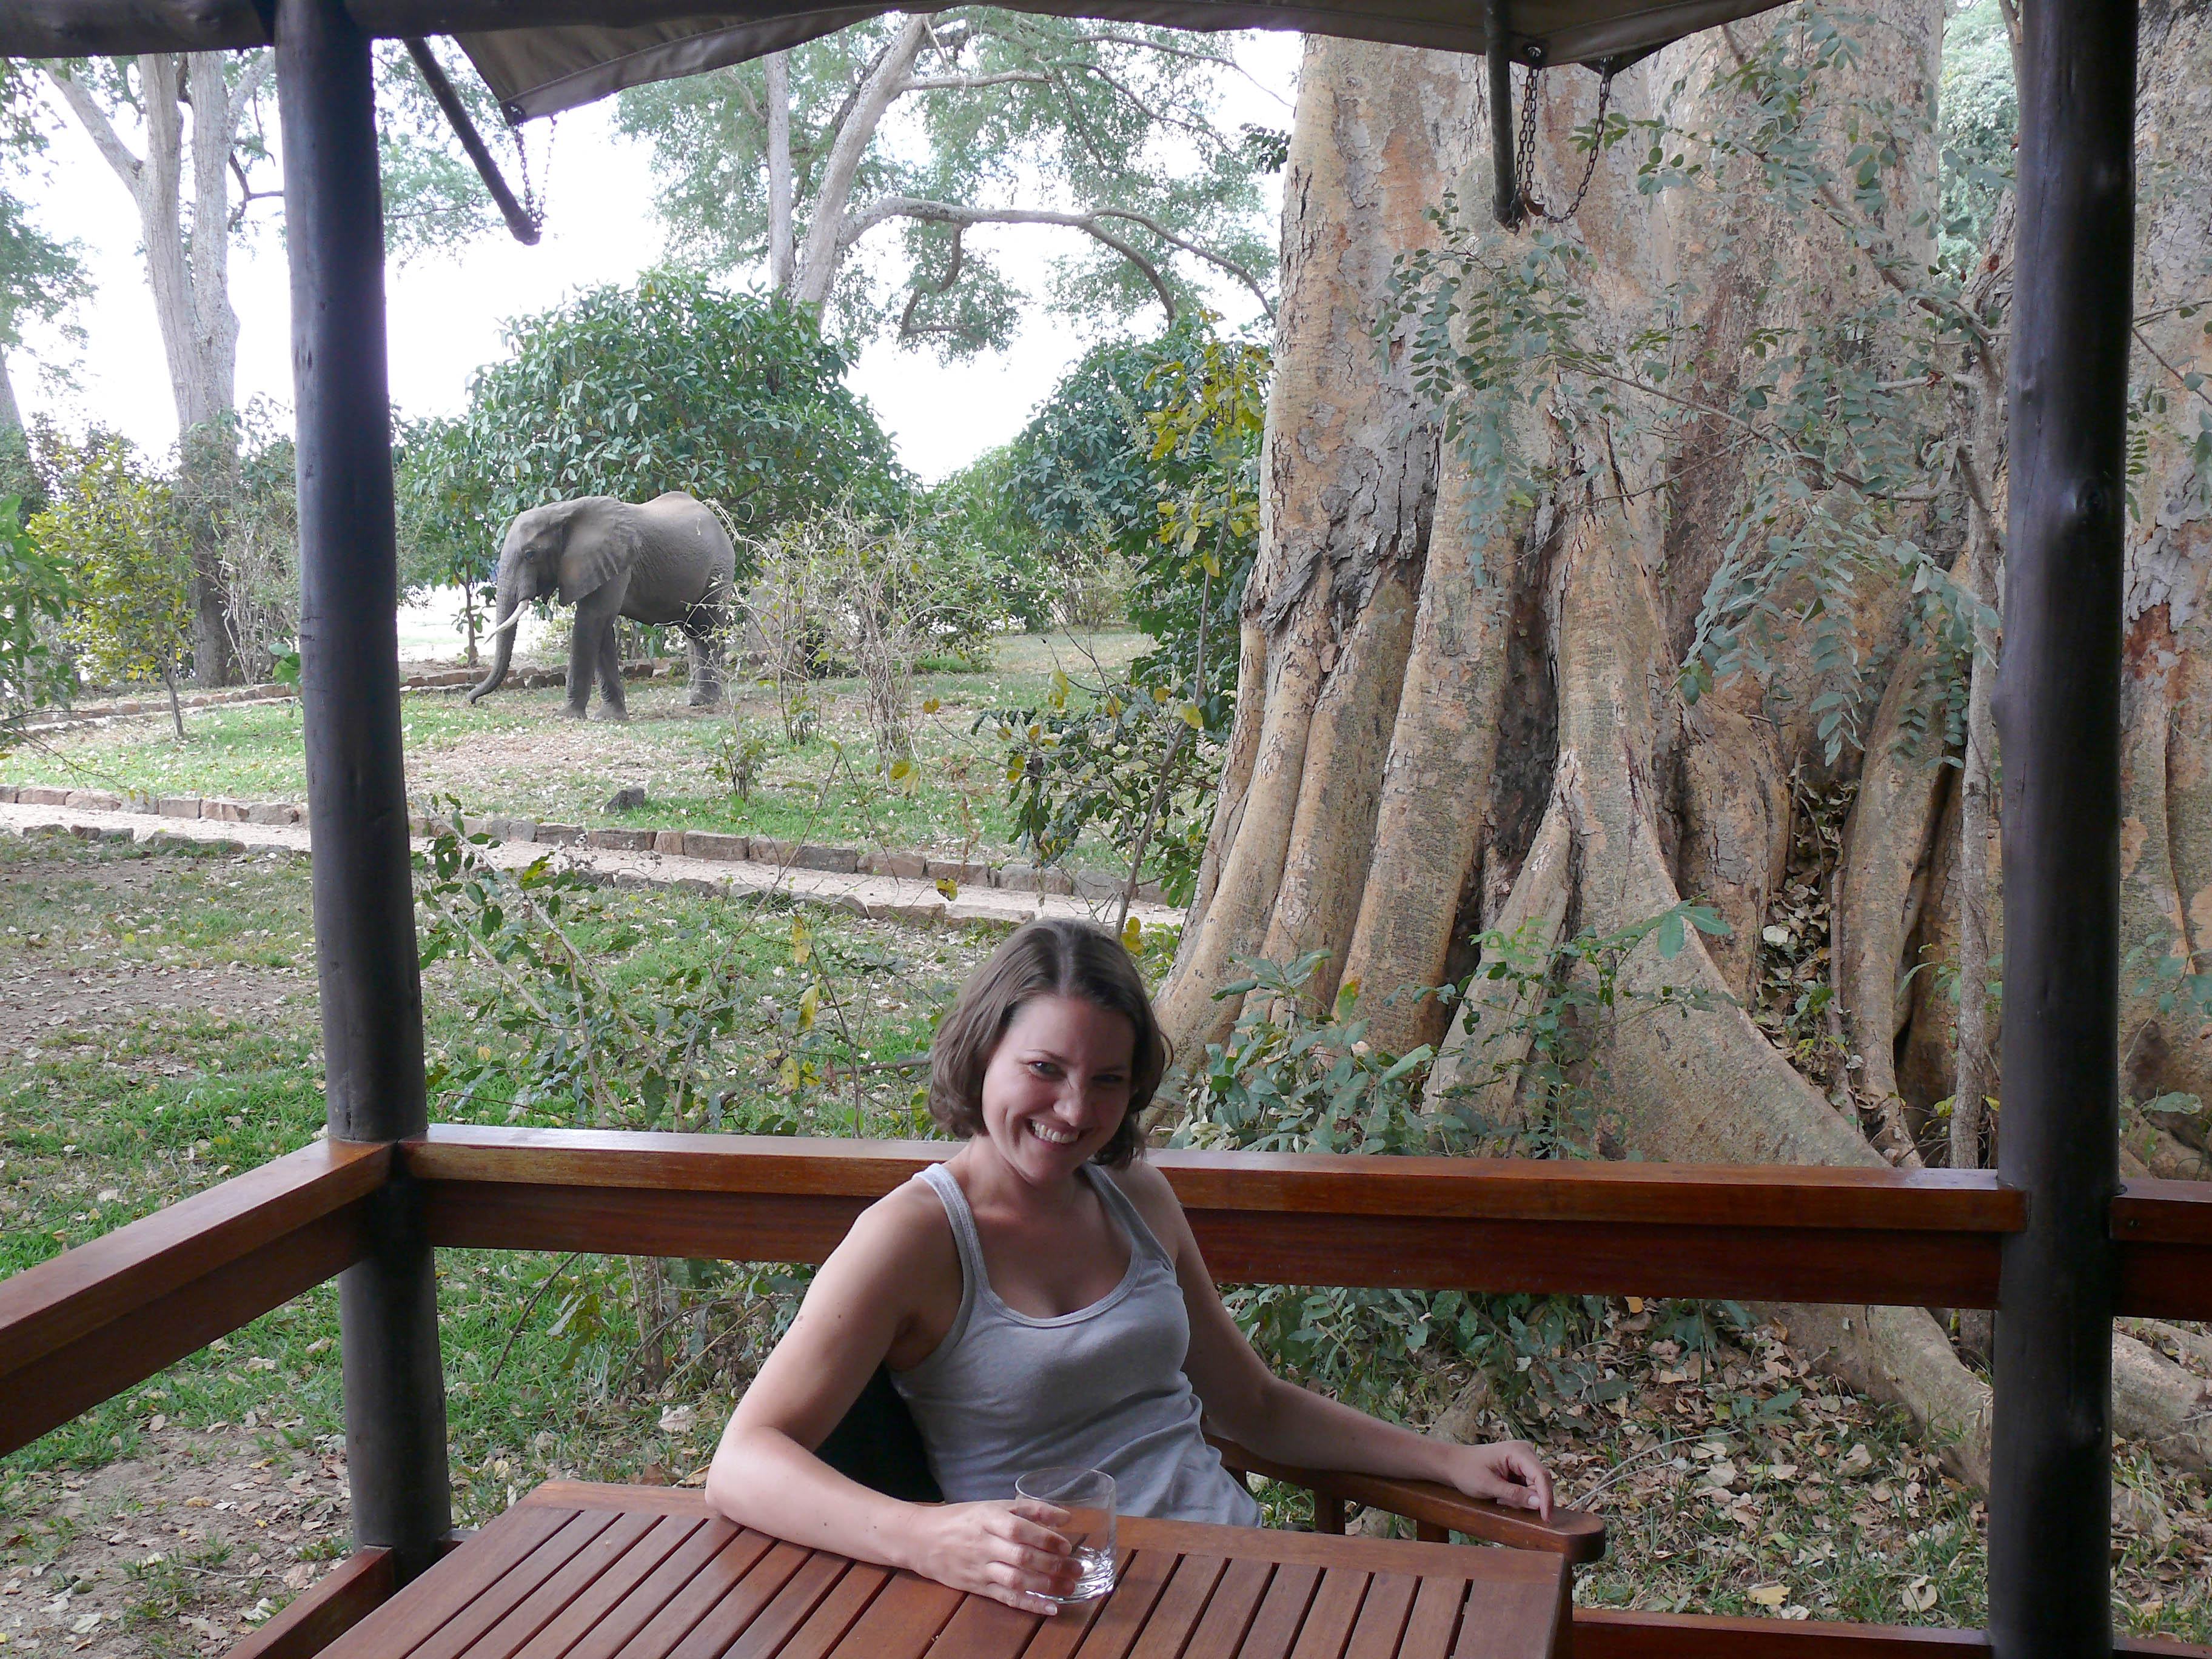 Knoller, Lugenda Lodge Elefant im Vorgarten tz